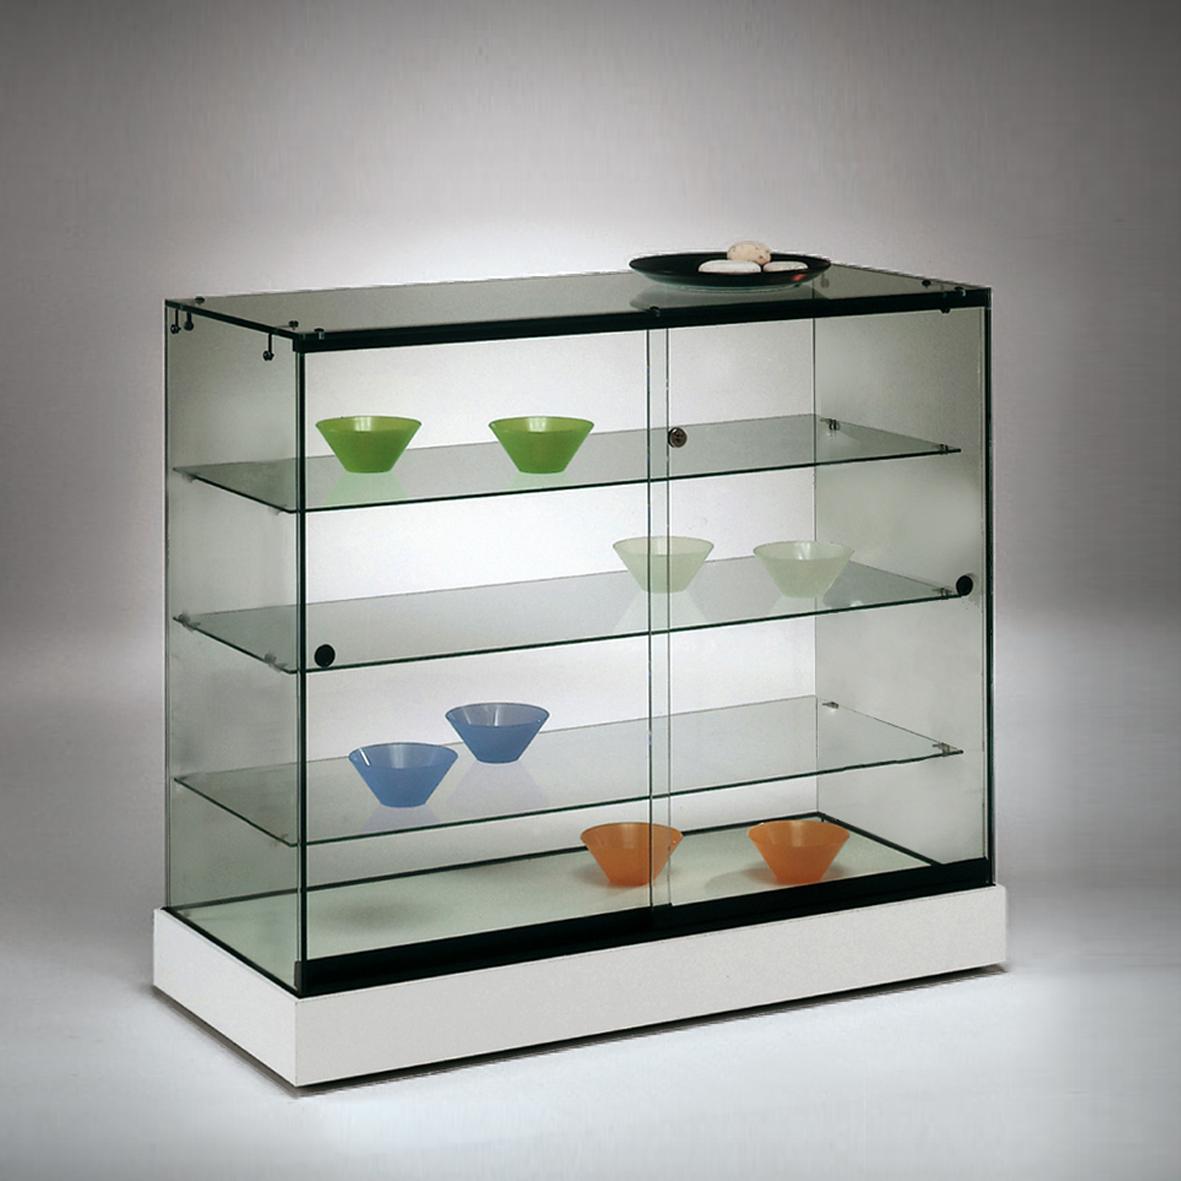 S146 Base Nova Frameless glass display counter with 3no. glass shelves lockable sliding doors and base 1